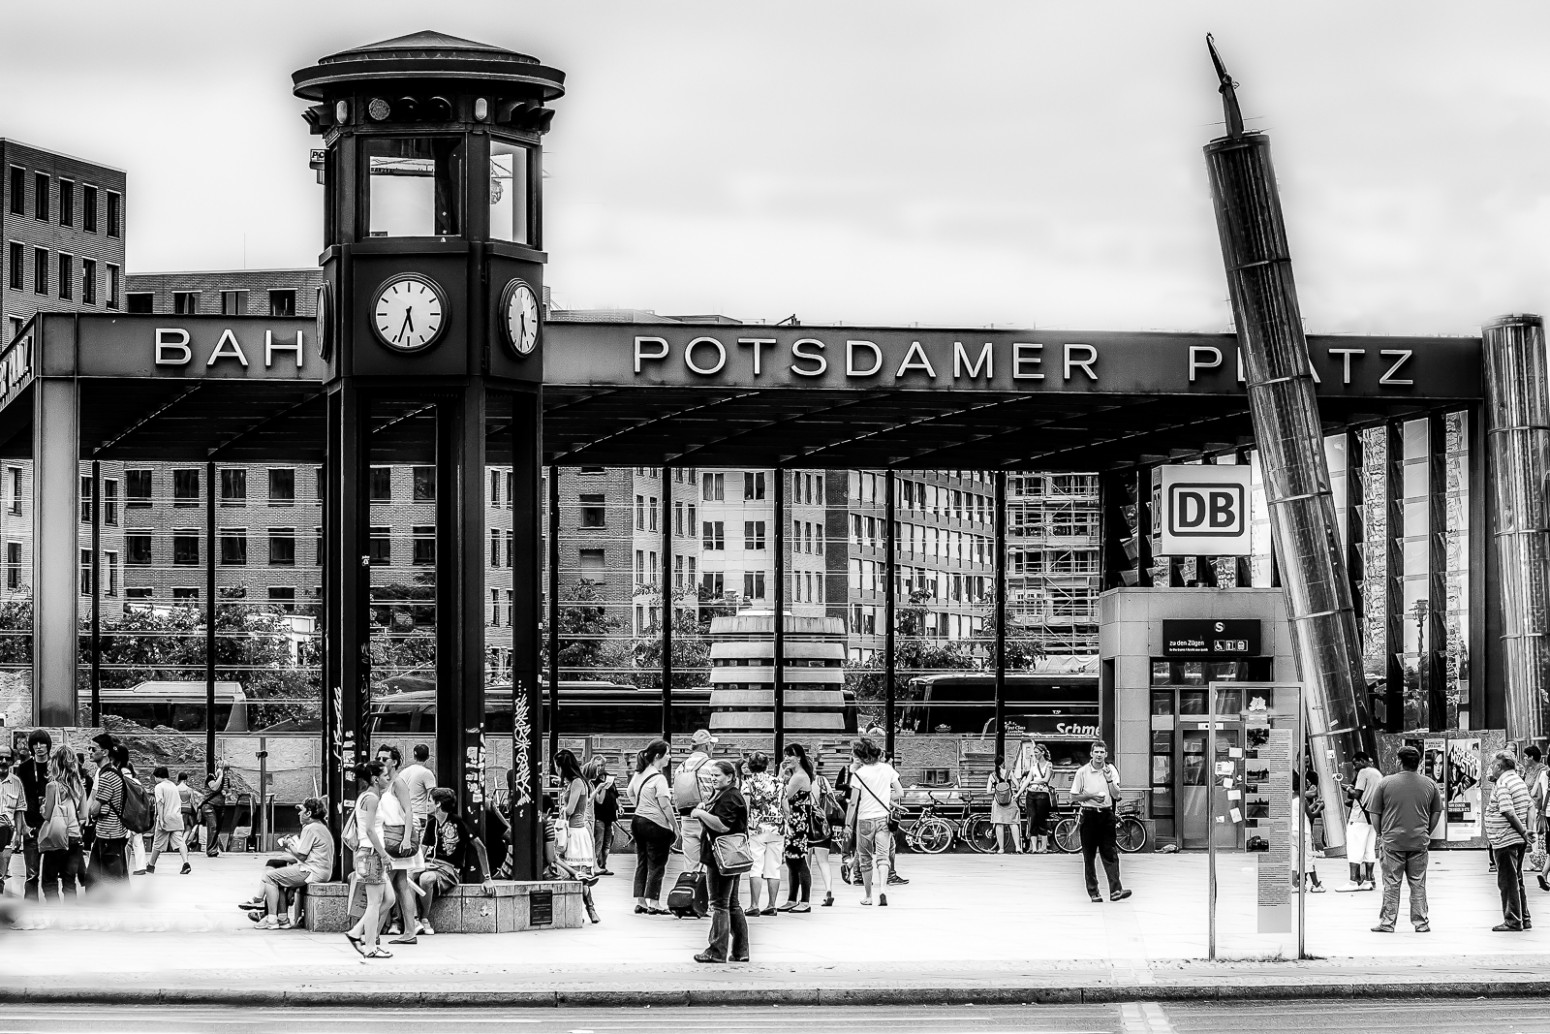 Bahnhof Potsdamer Platz. Berlin